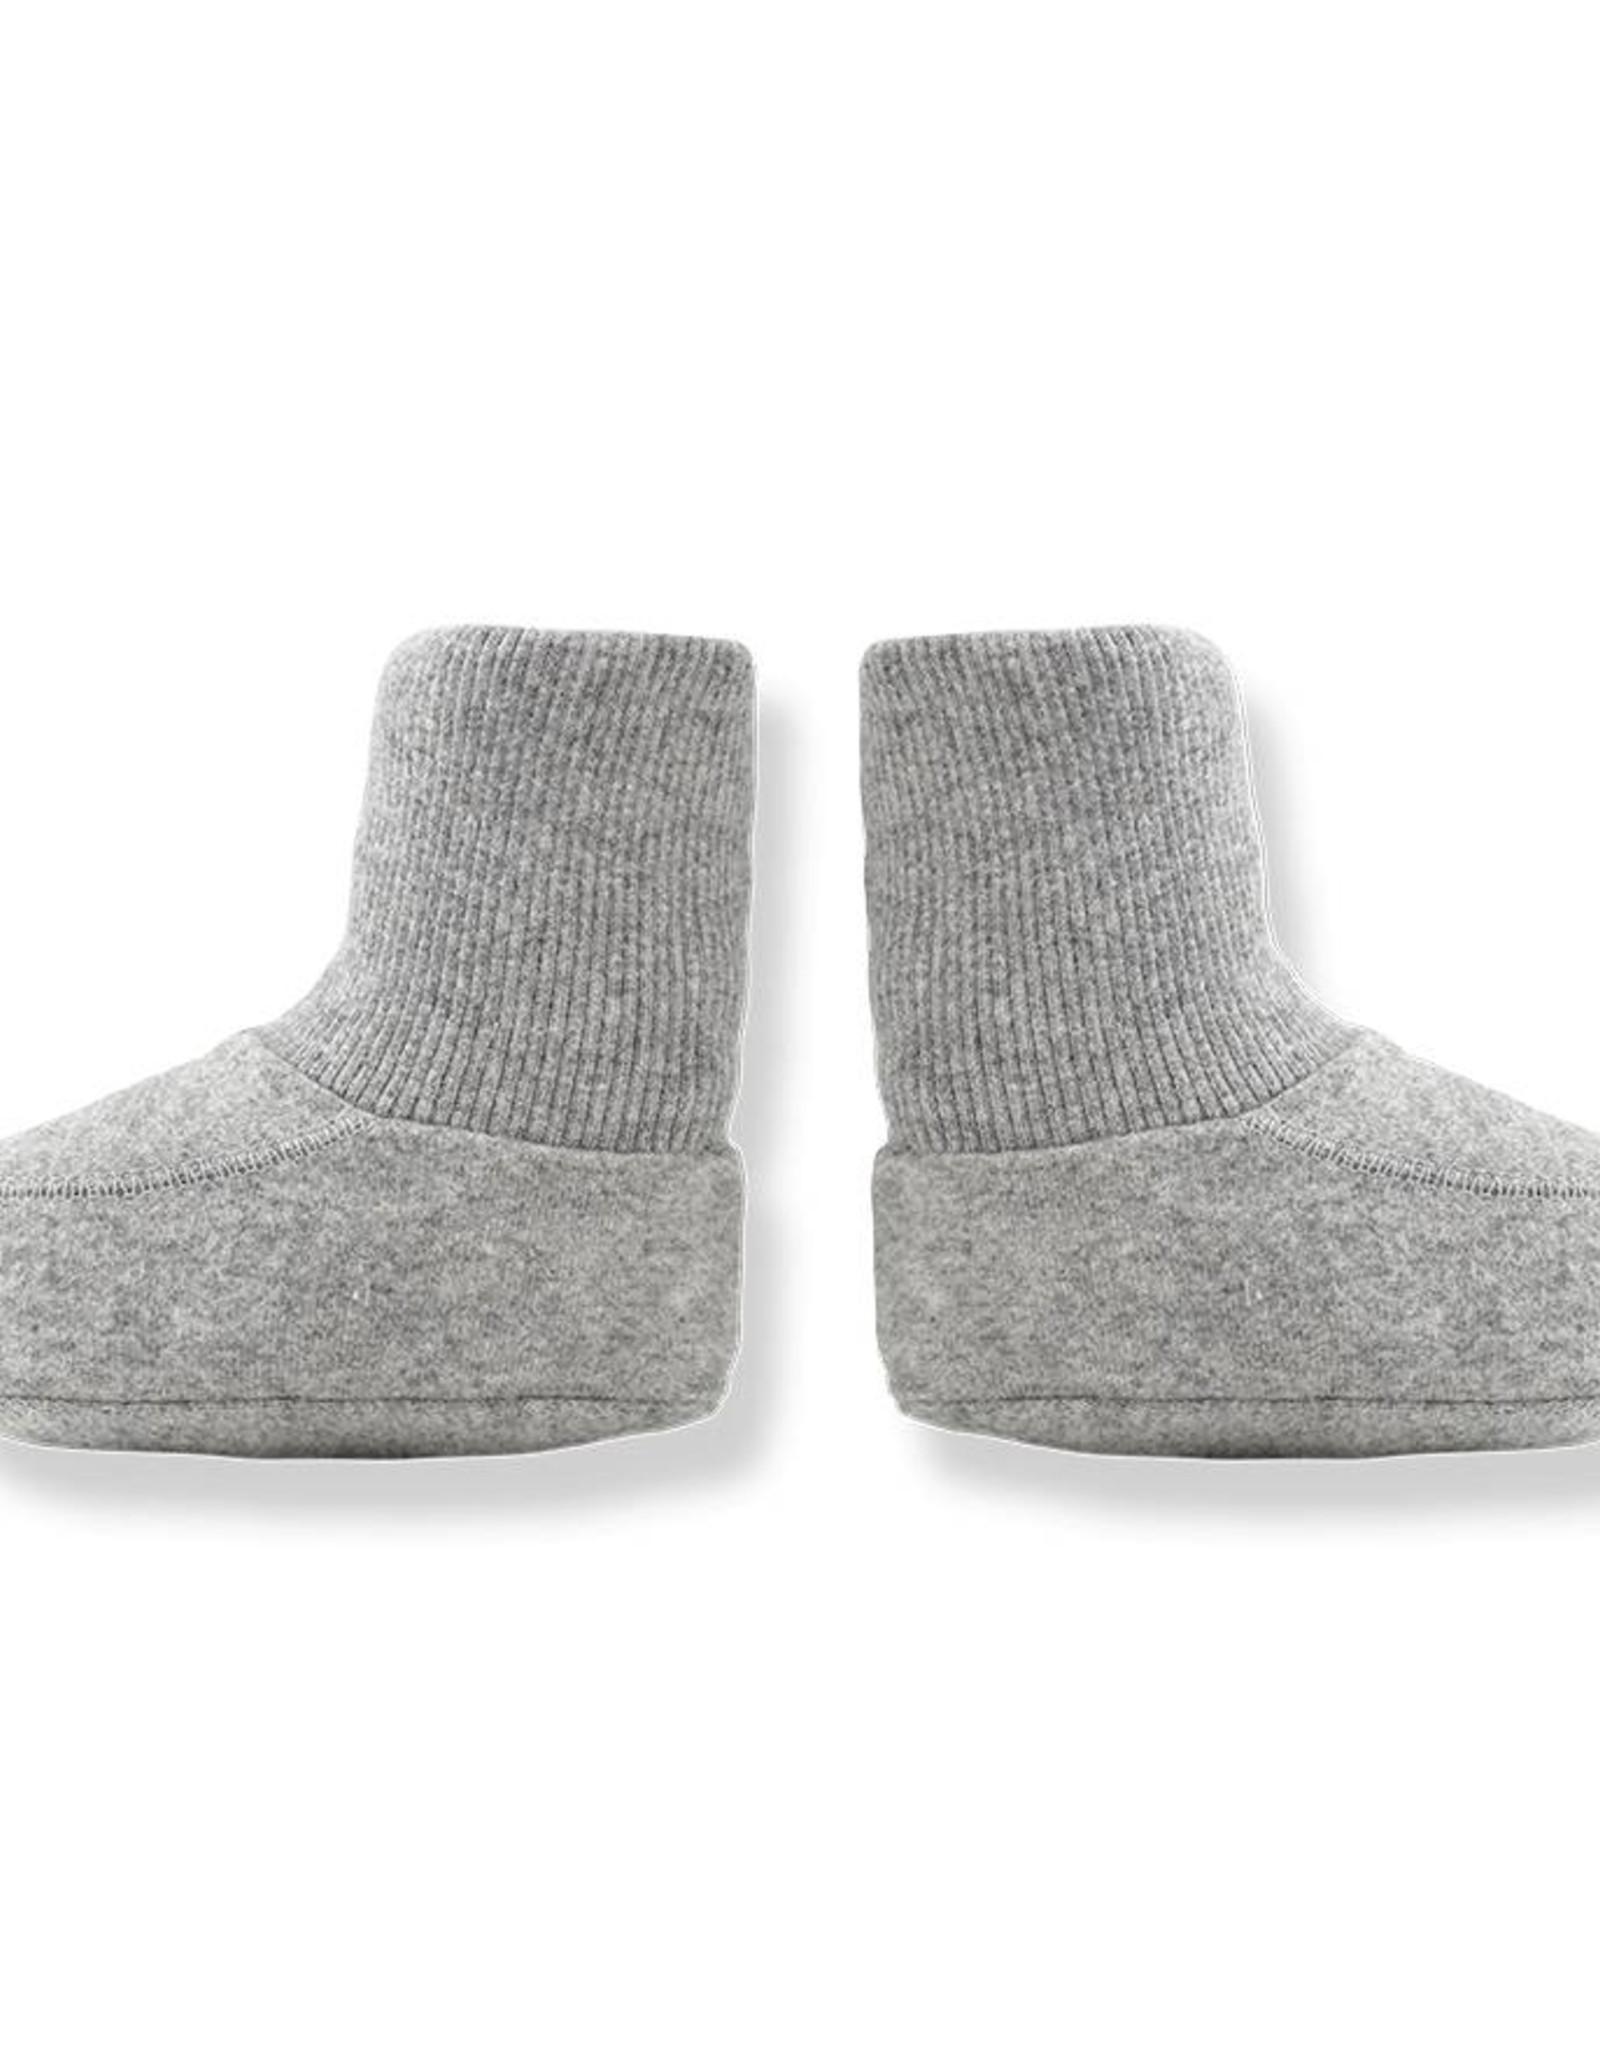 Tito slippers